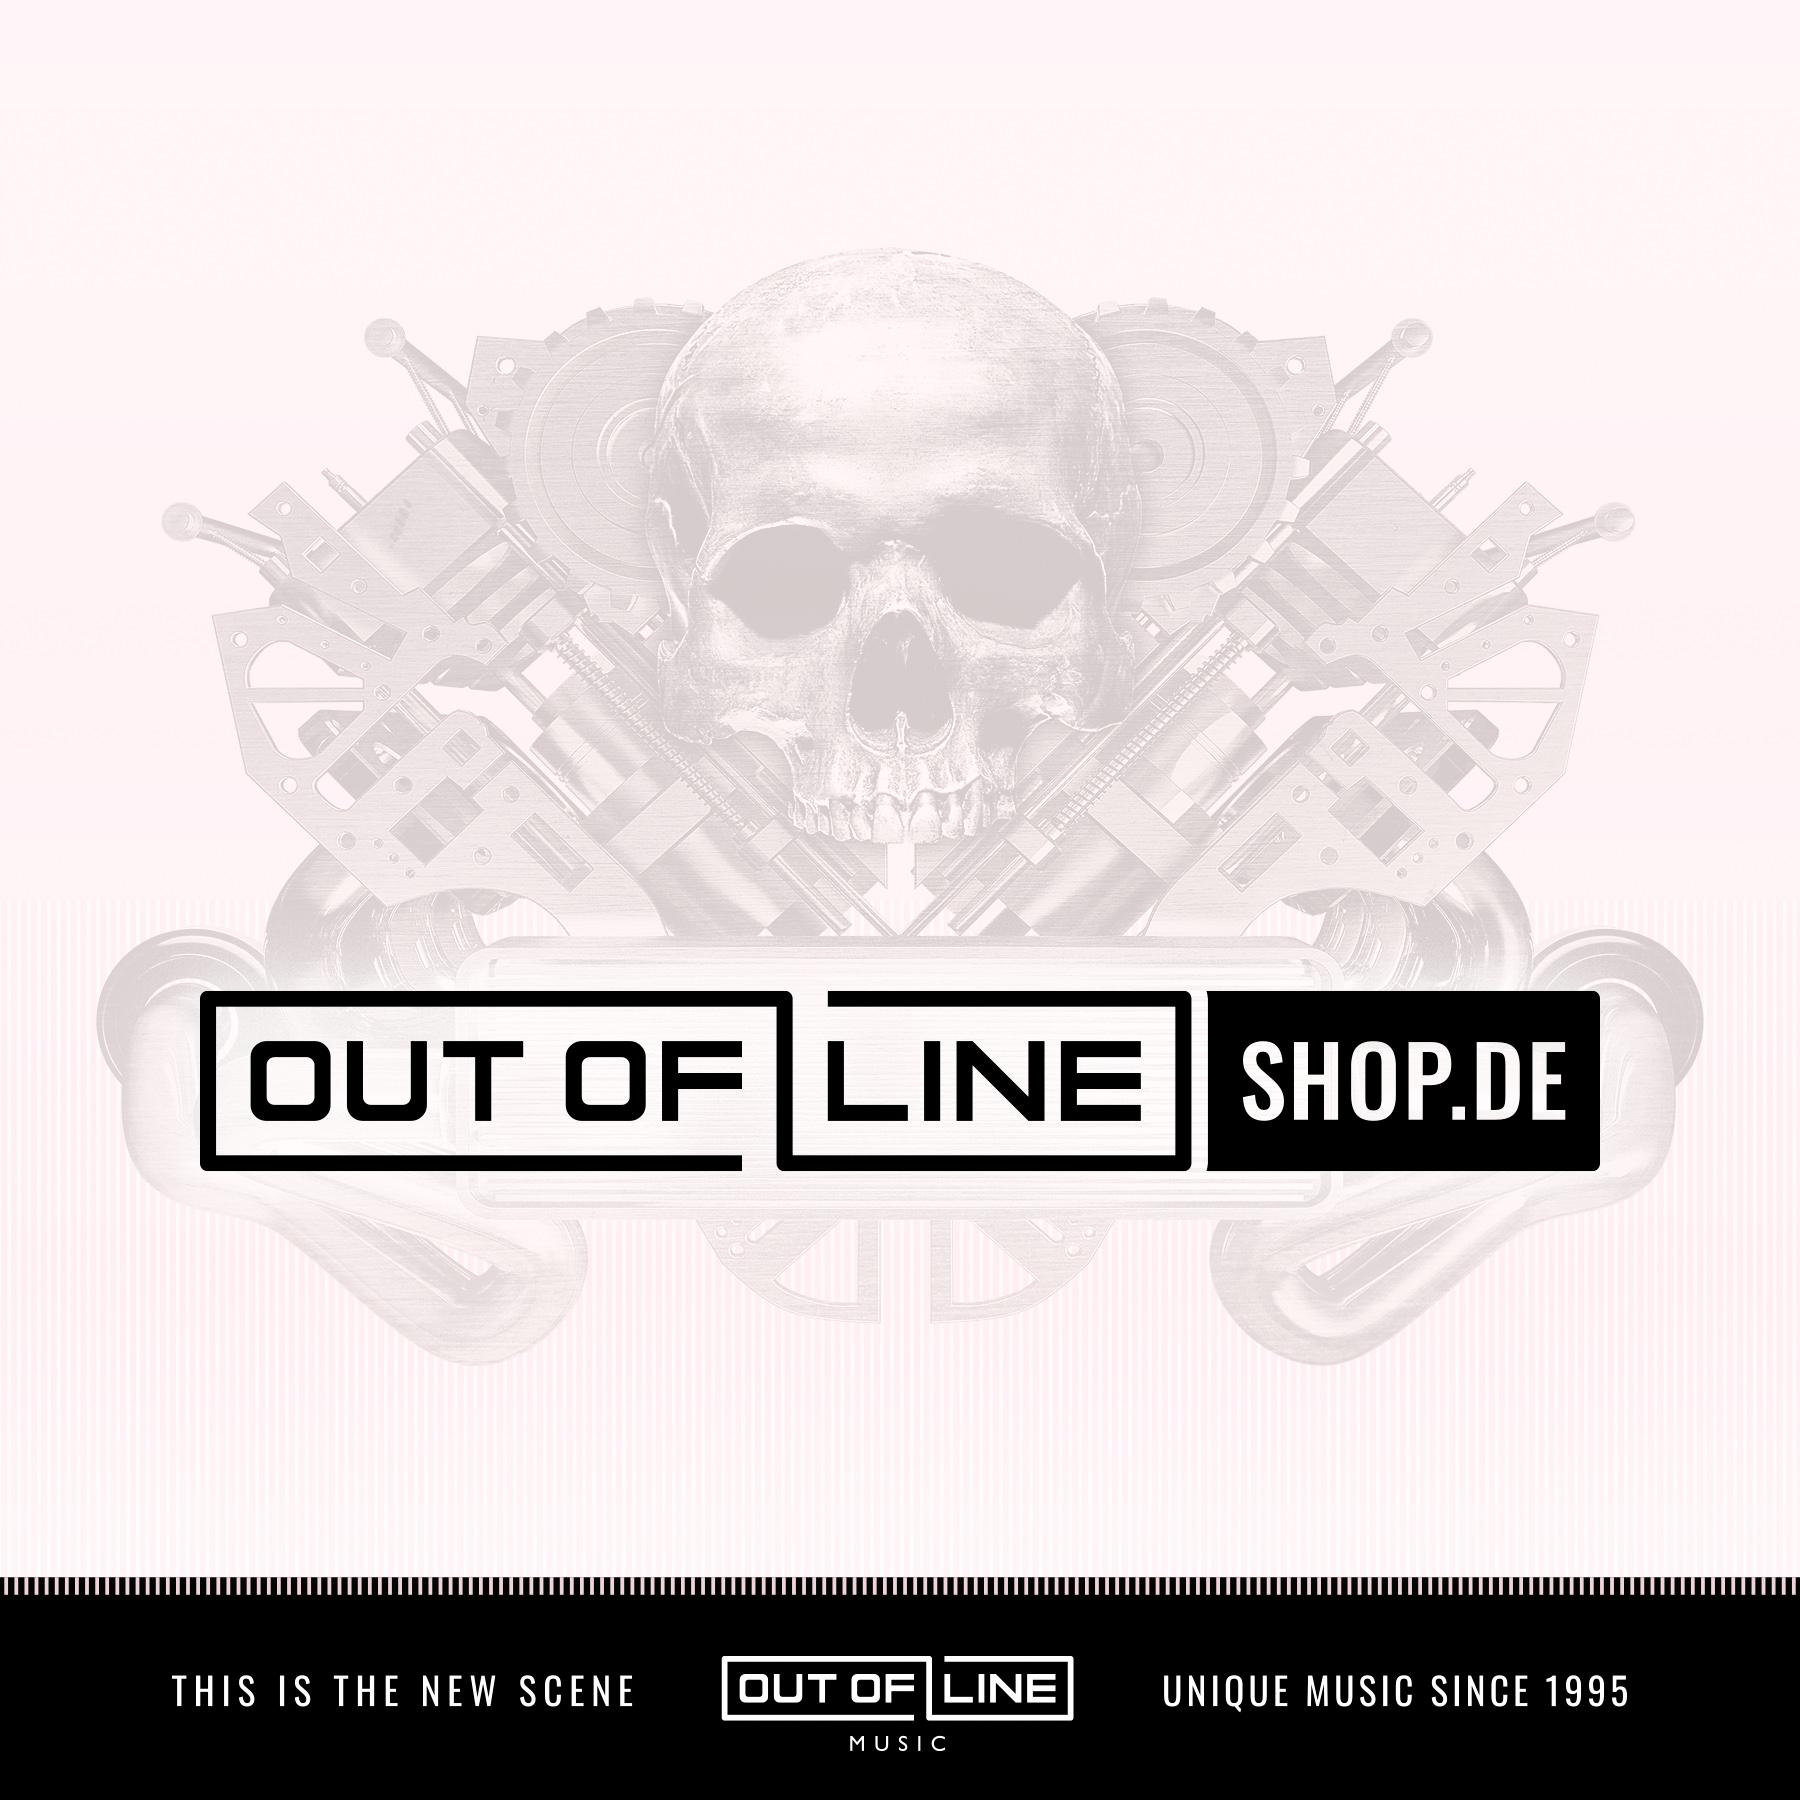 Blutengel - Weihnachtskugeln 3er Set (Limited Edition) - Christmas Baubles